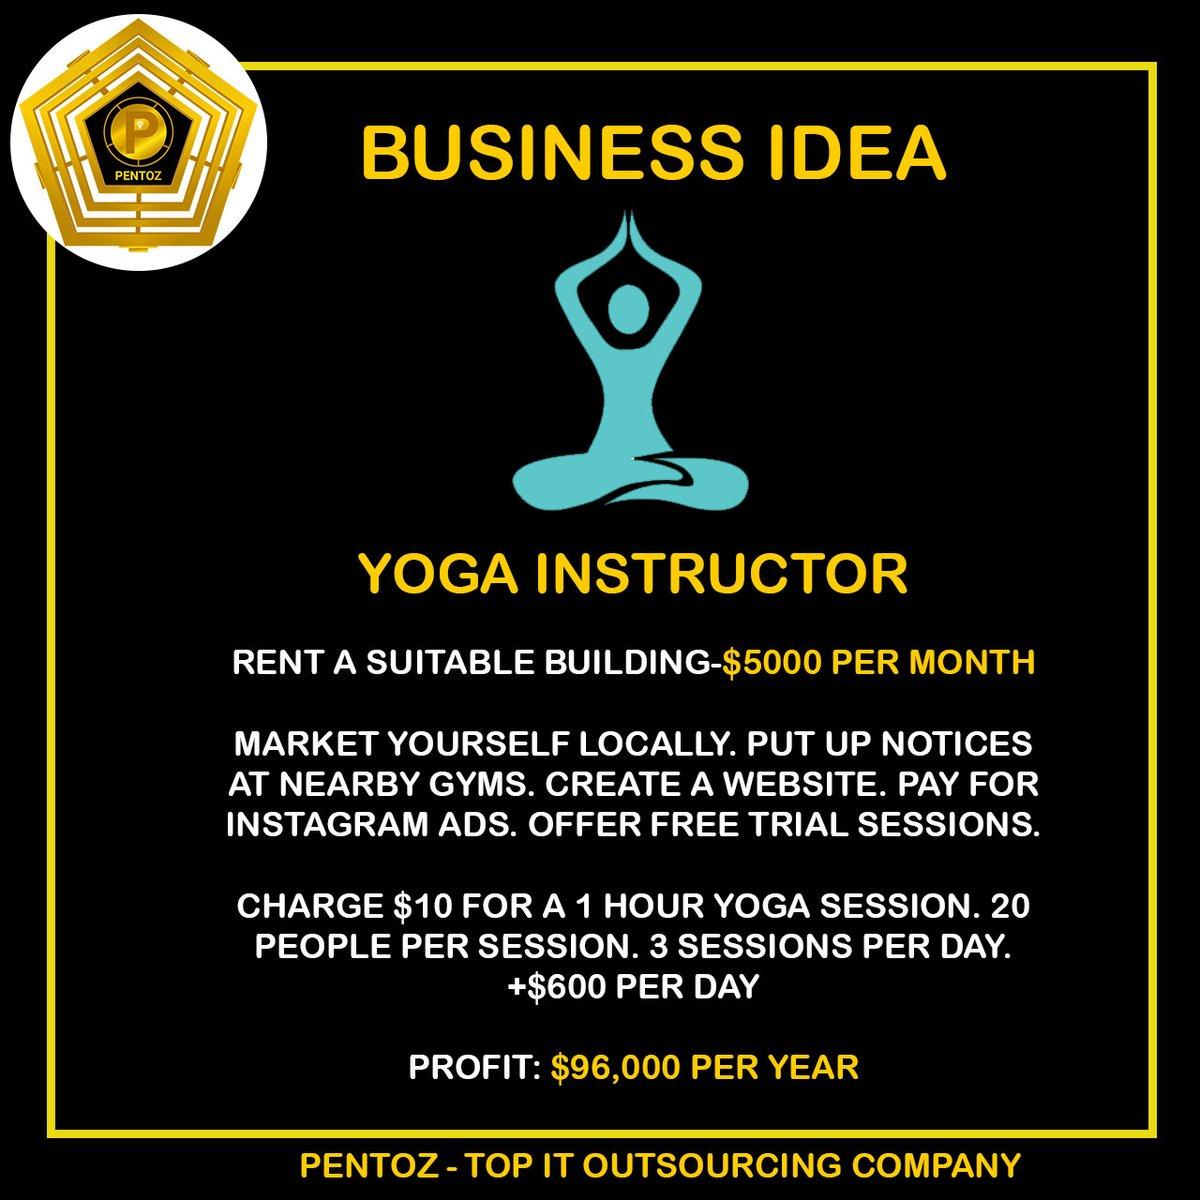 test Twitter Media - Business Idea: Yoga Instructor  Tag an entrepreneur   #business #idea #businessidea #startup #pentoz #innovation #firm https://t.co/FWuWmdhkcr